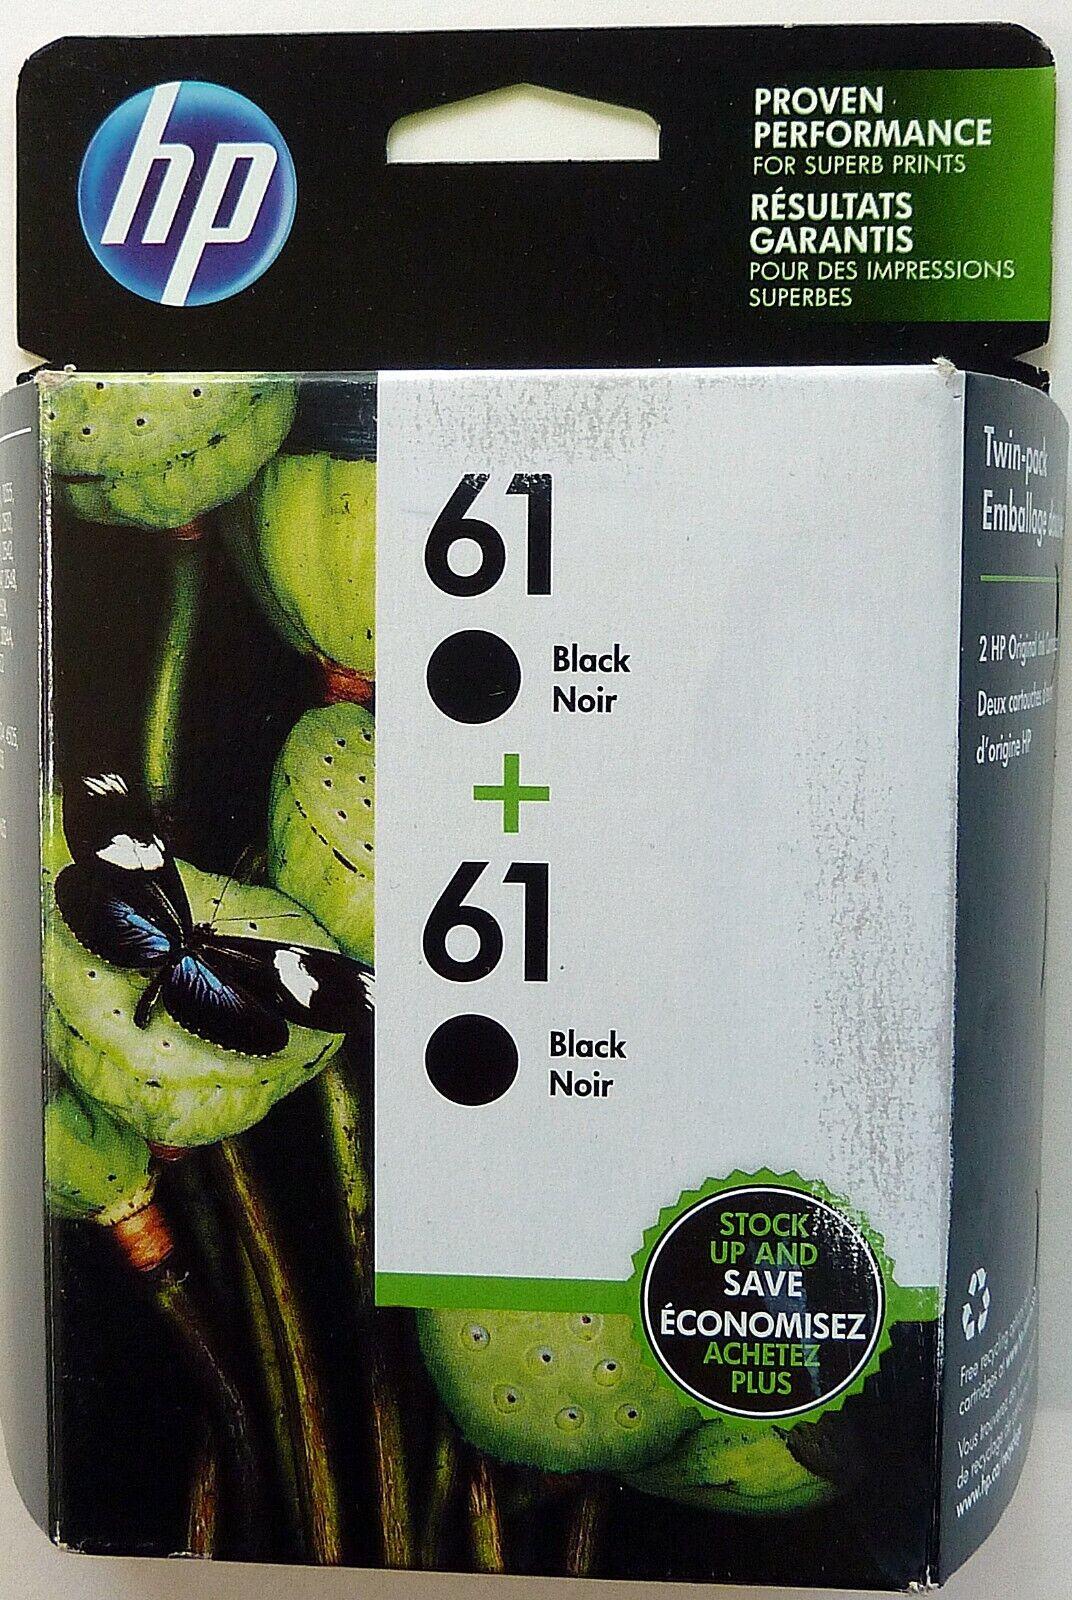 HP 61 2-Pack Black Original Ink Cartridges - New In Box - Exp. 11-2020 - $23.95